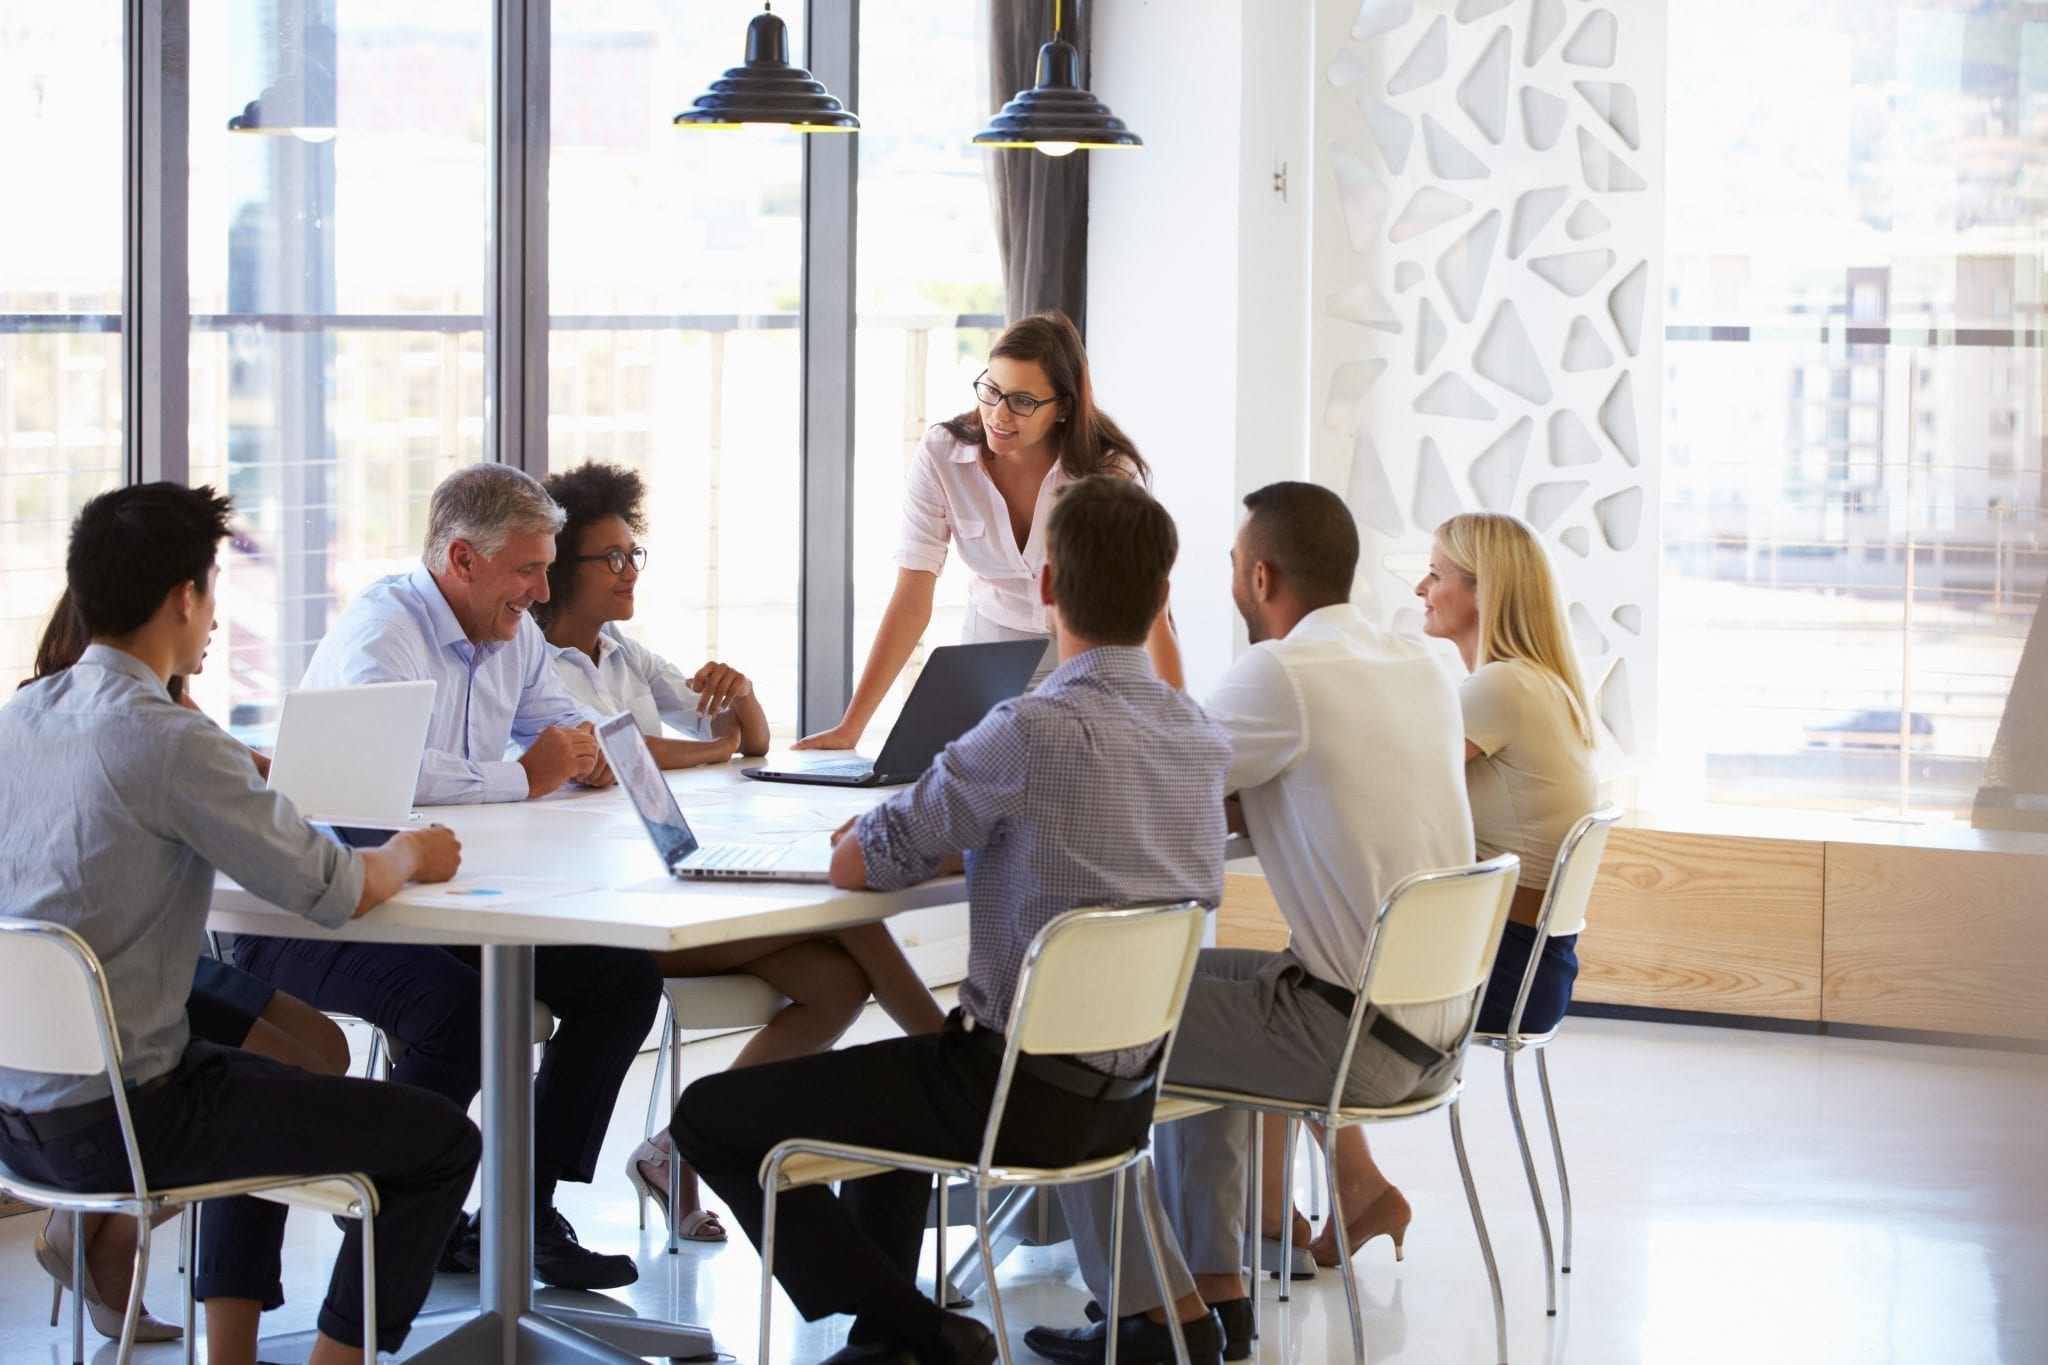 workplace creativity ideas